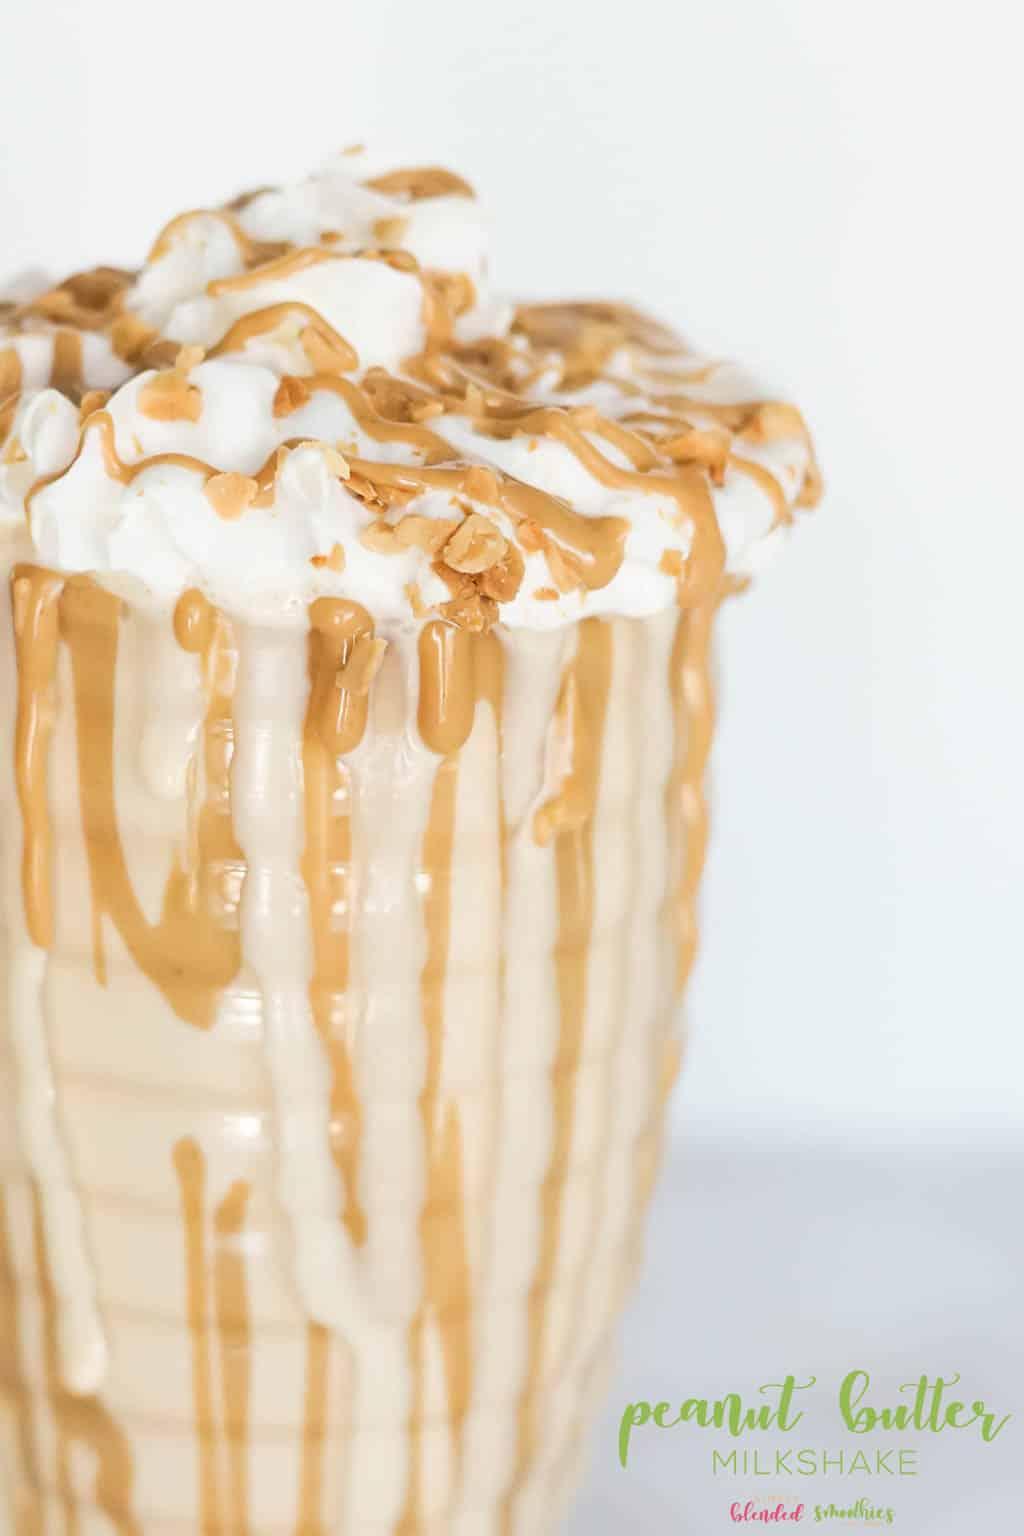 Peanut Butter Milkshake Recipe With Only 3 Ingredients